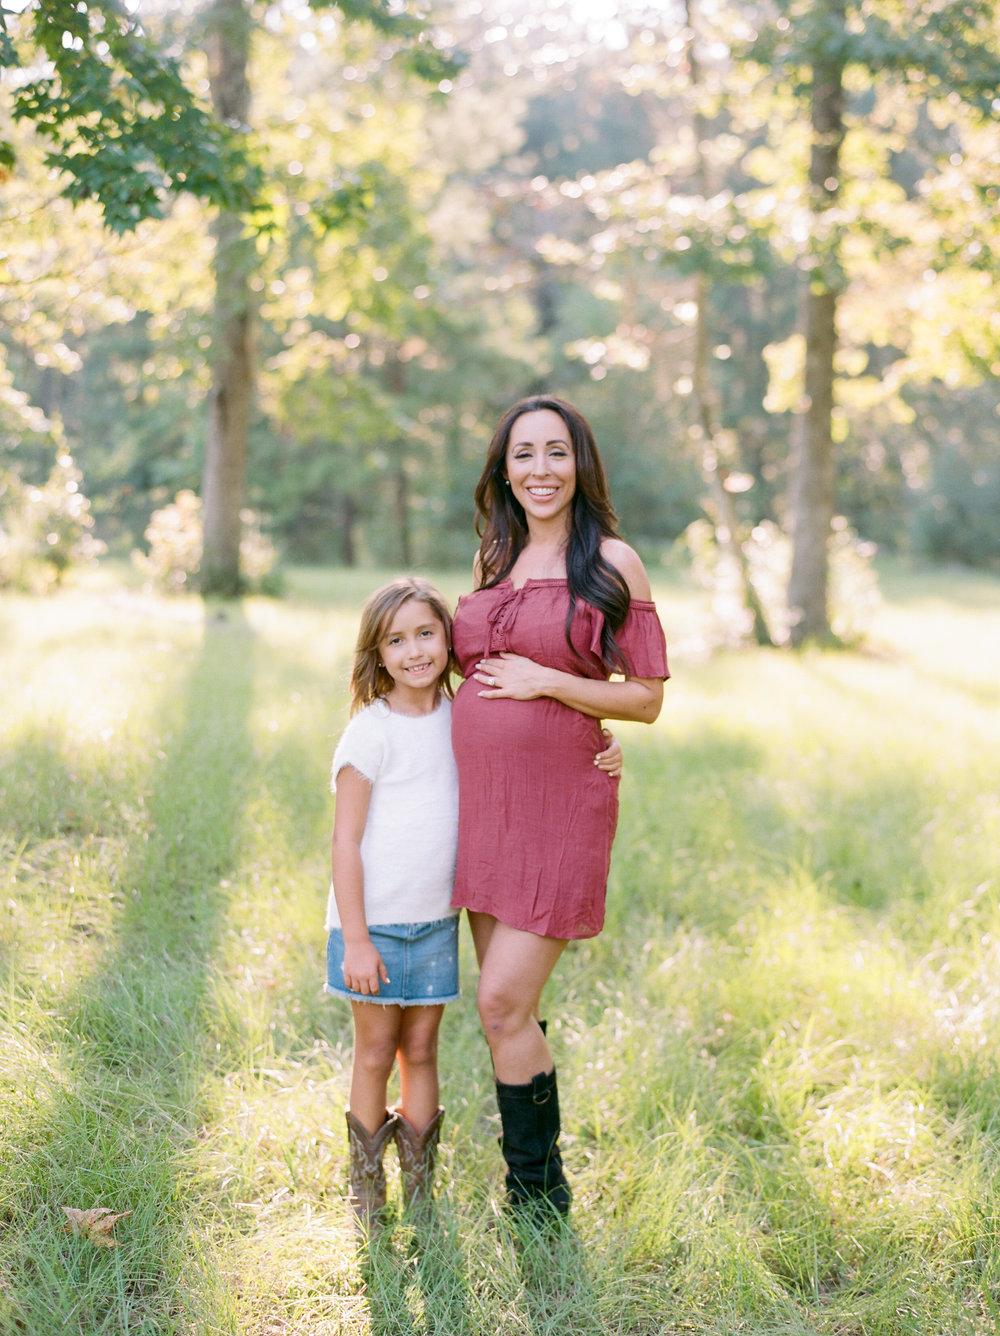 Fine-Art-Film-Houston-Wedding-Photographer-Best-Top-Luxury-Texas-Austin-Dallas-Destination-Dana-Fernandez-Photography-Portrait-Mommy-and-Me-Session-8-2.jpg